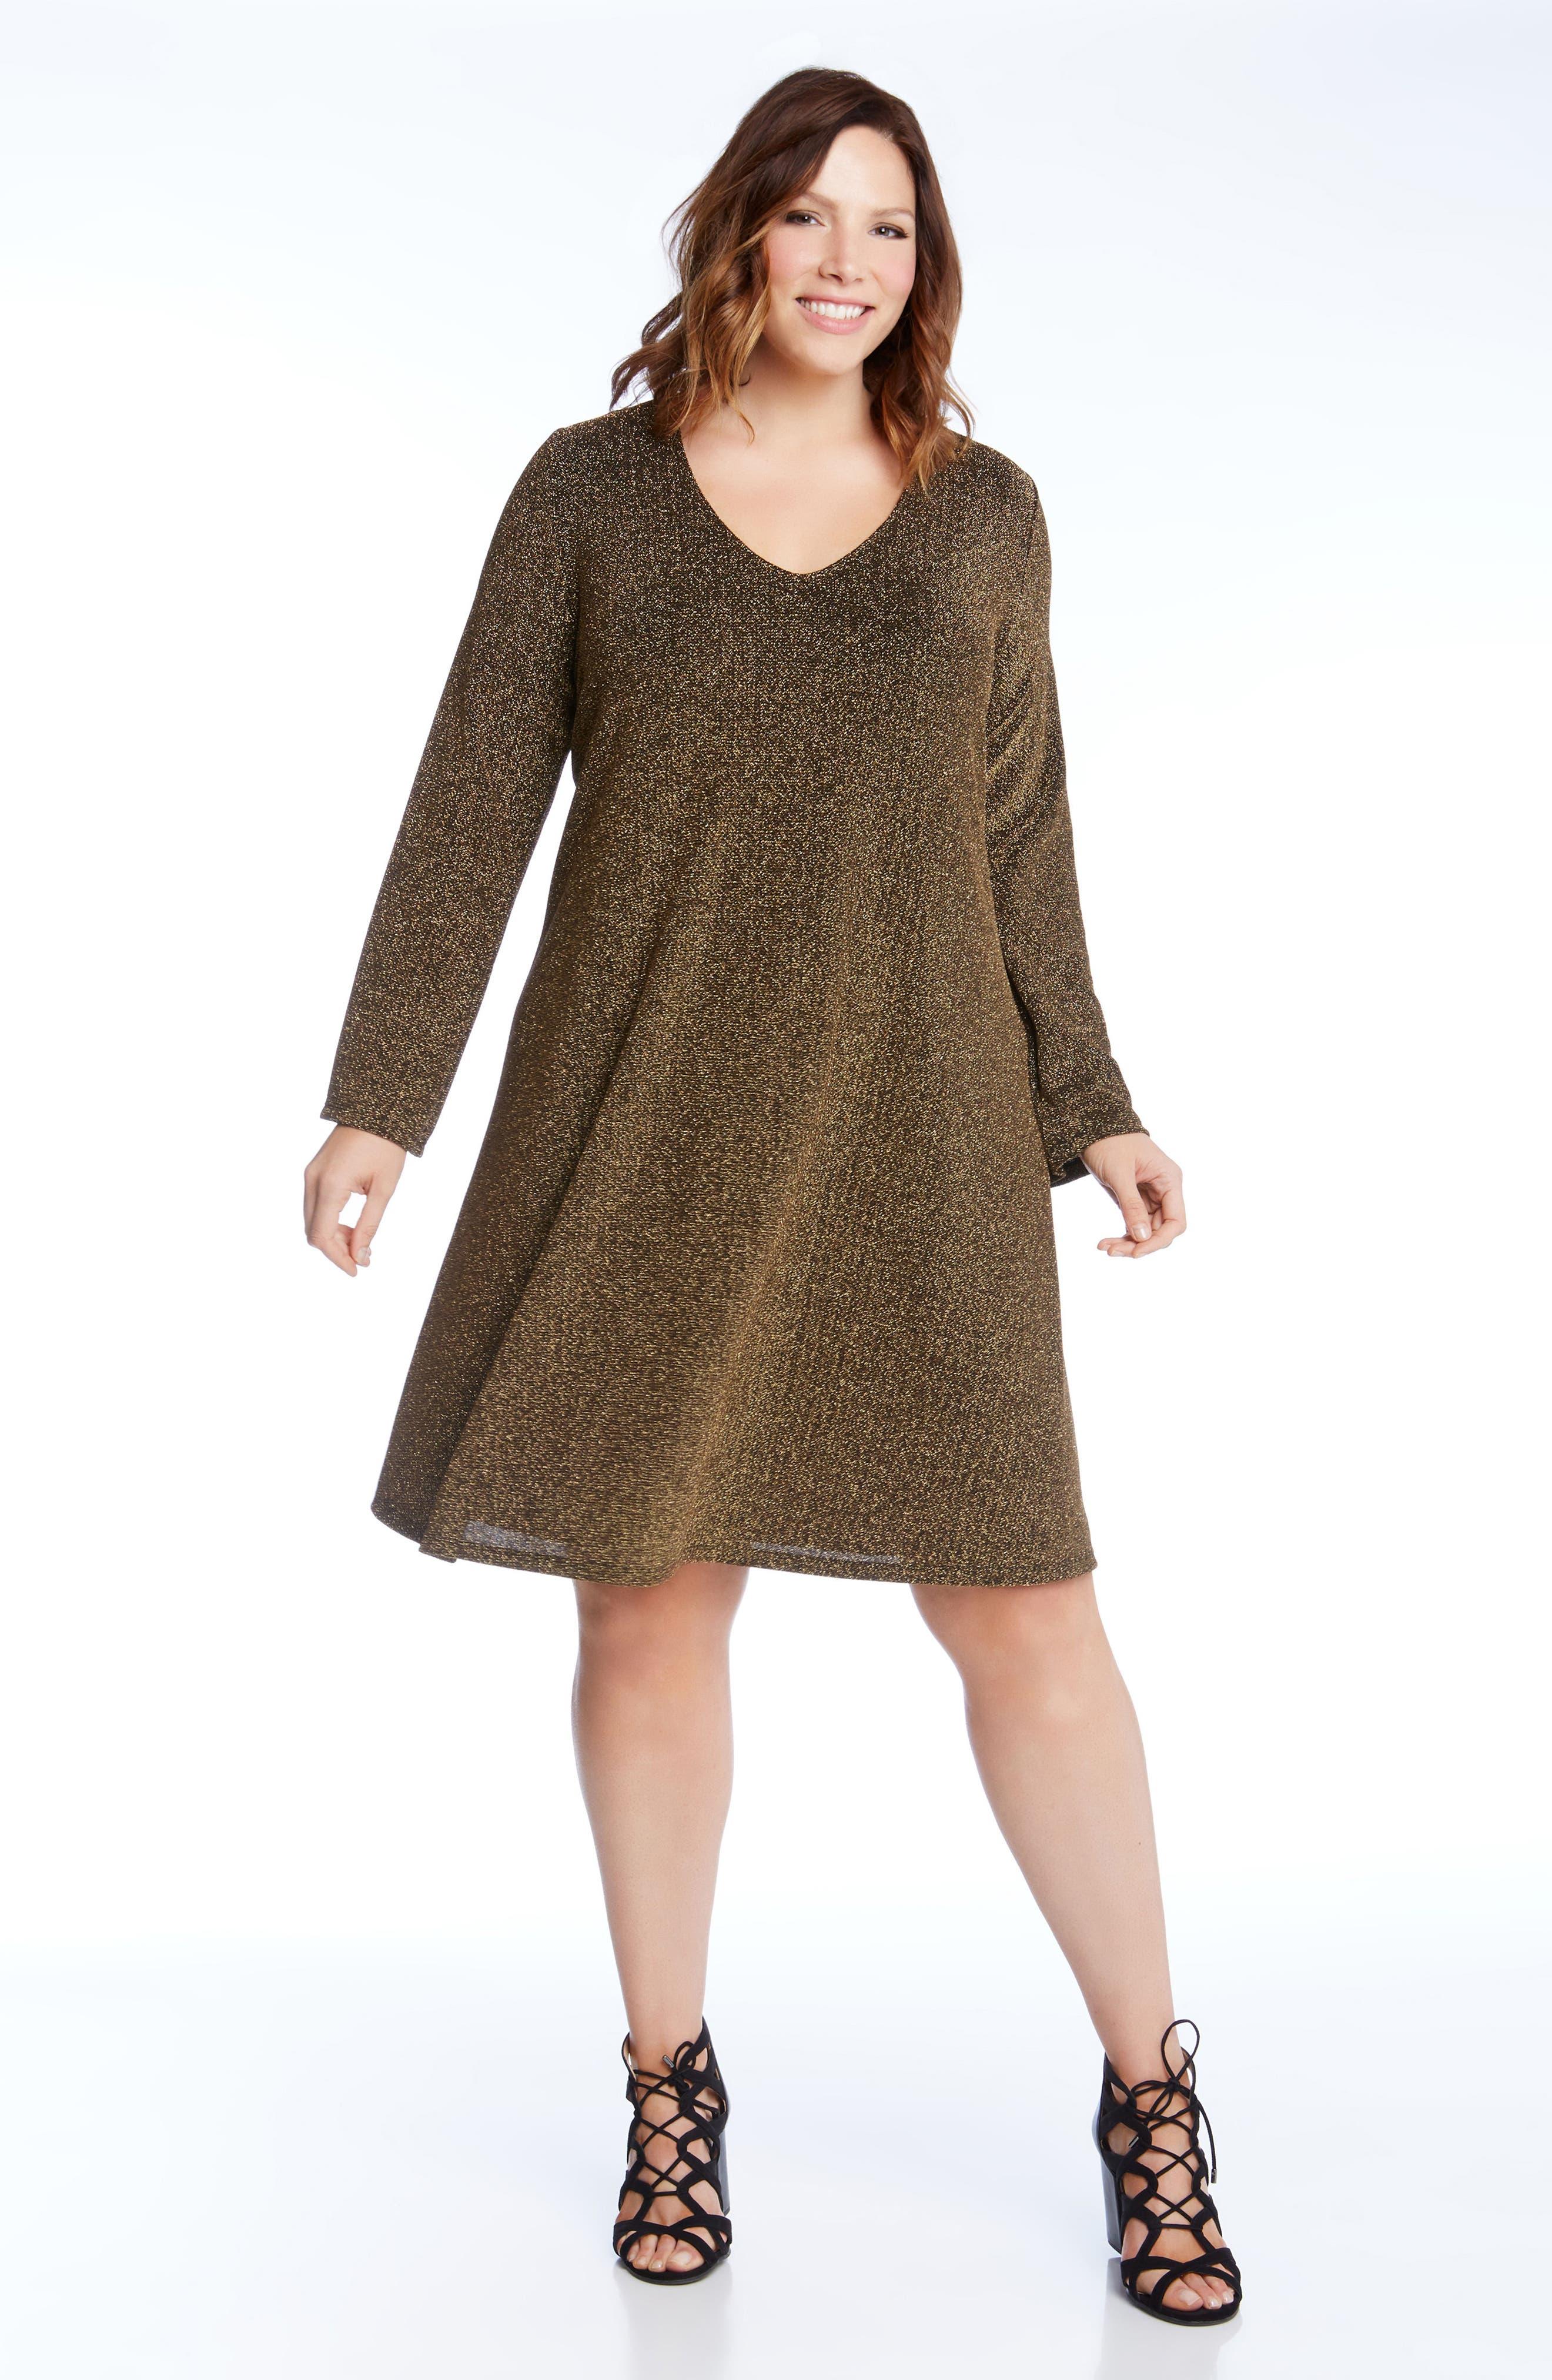 Taylor Gold Knit Dress,                             Alternate thumbnail 3, color,                             Gold